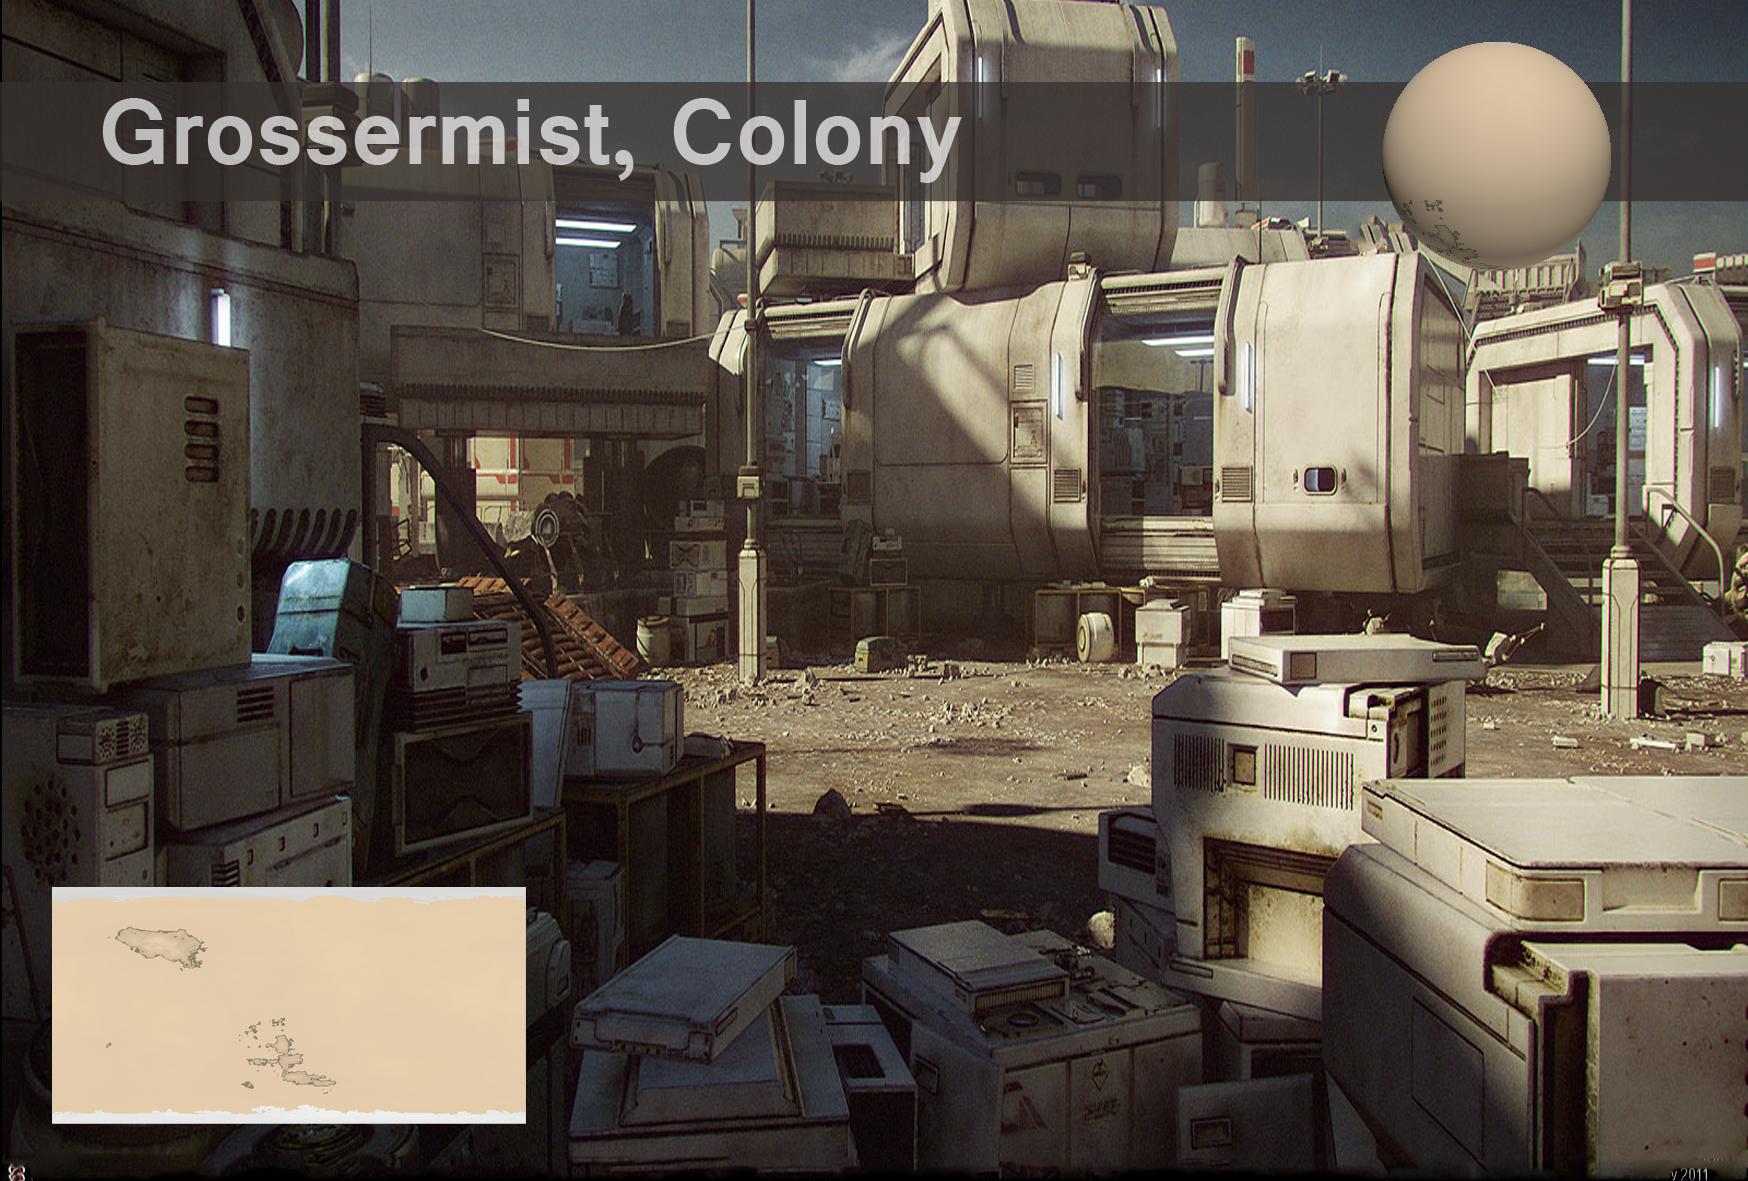 Grossermist, Colony